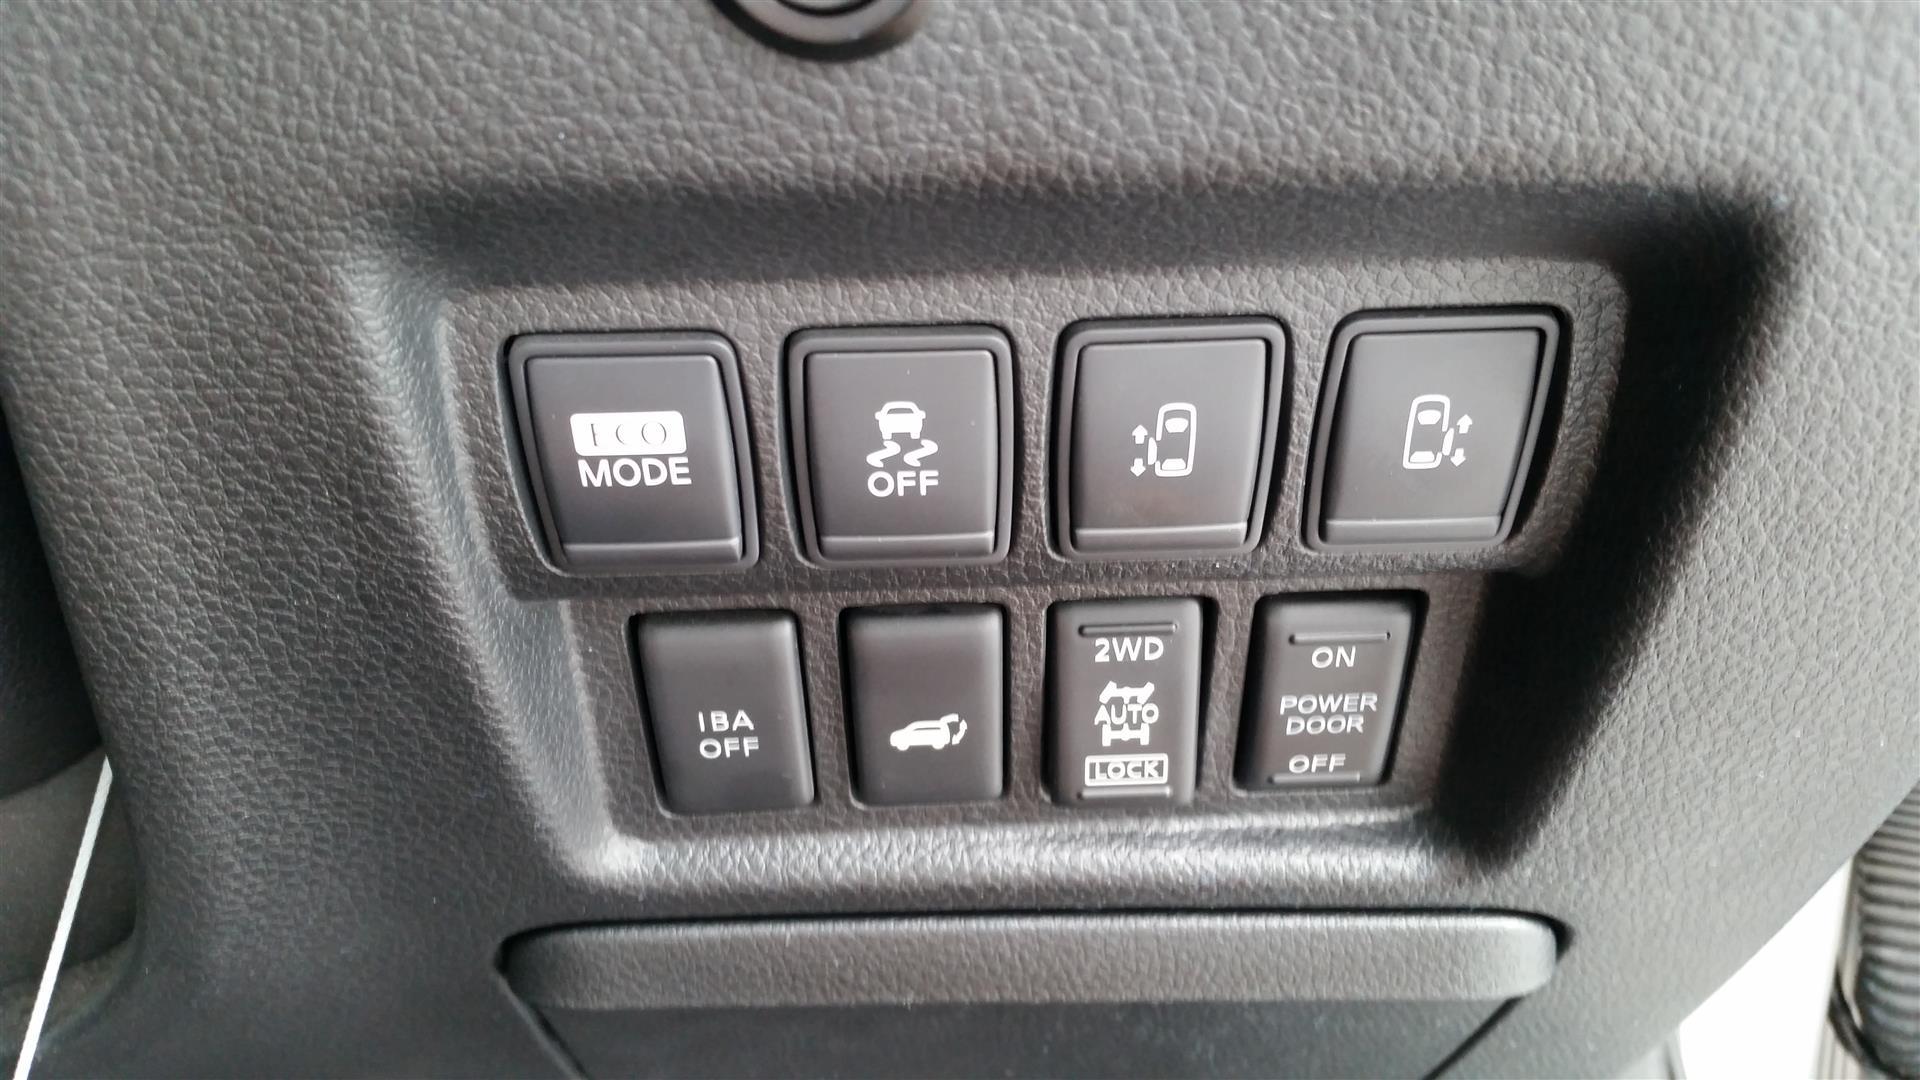 2012 Nissan Elgrand E52 20150627_143500 (Large)